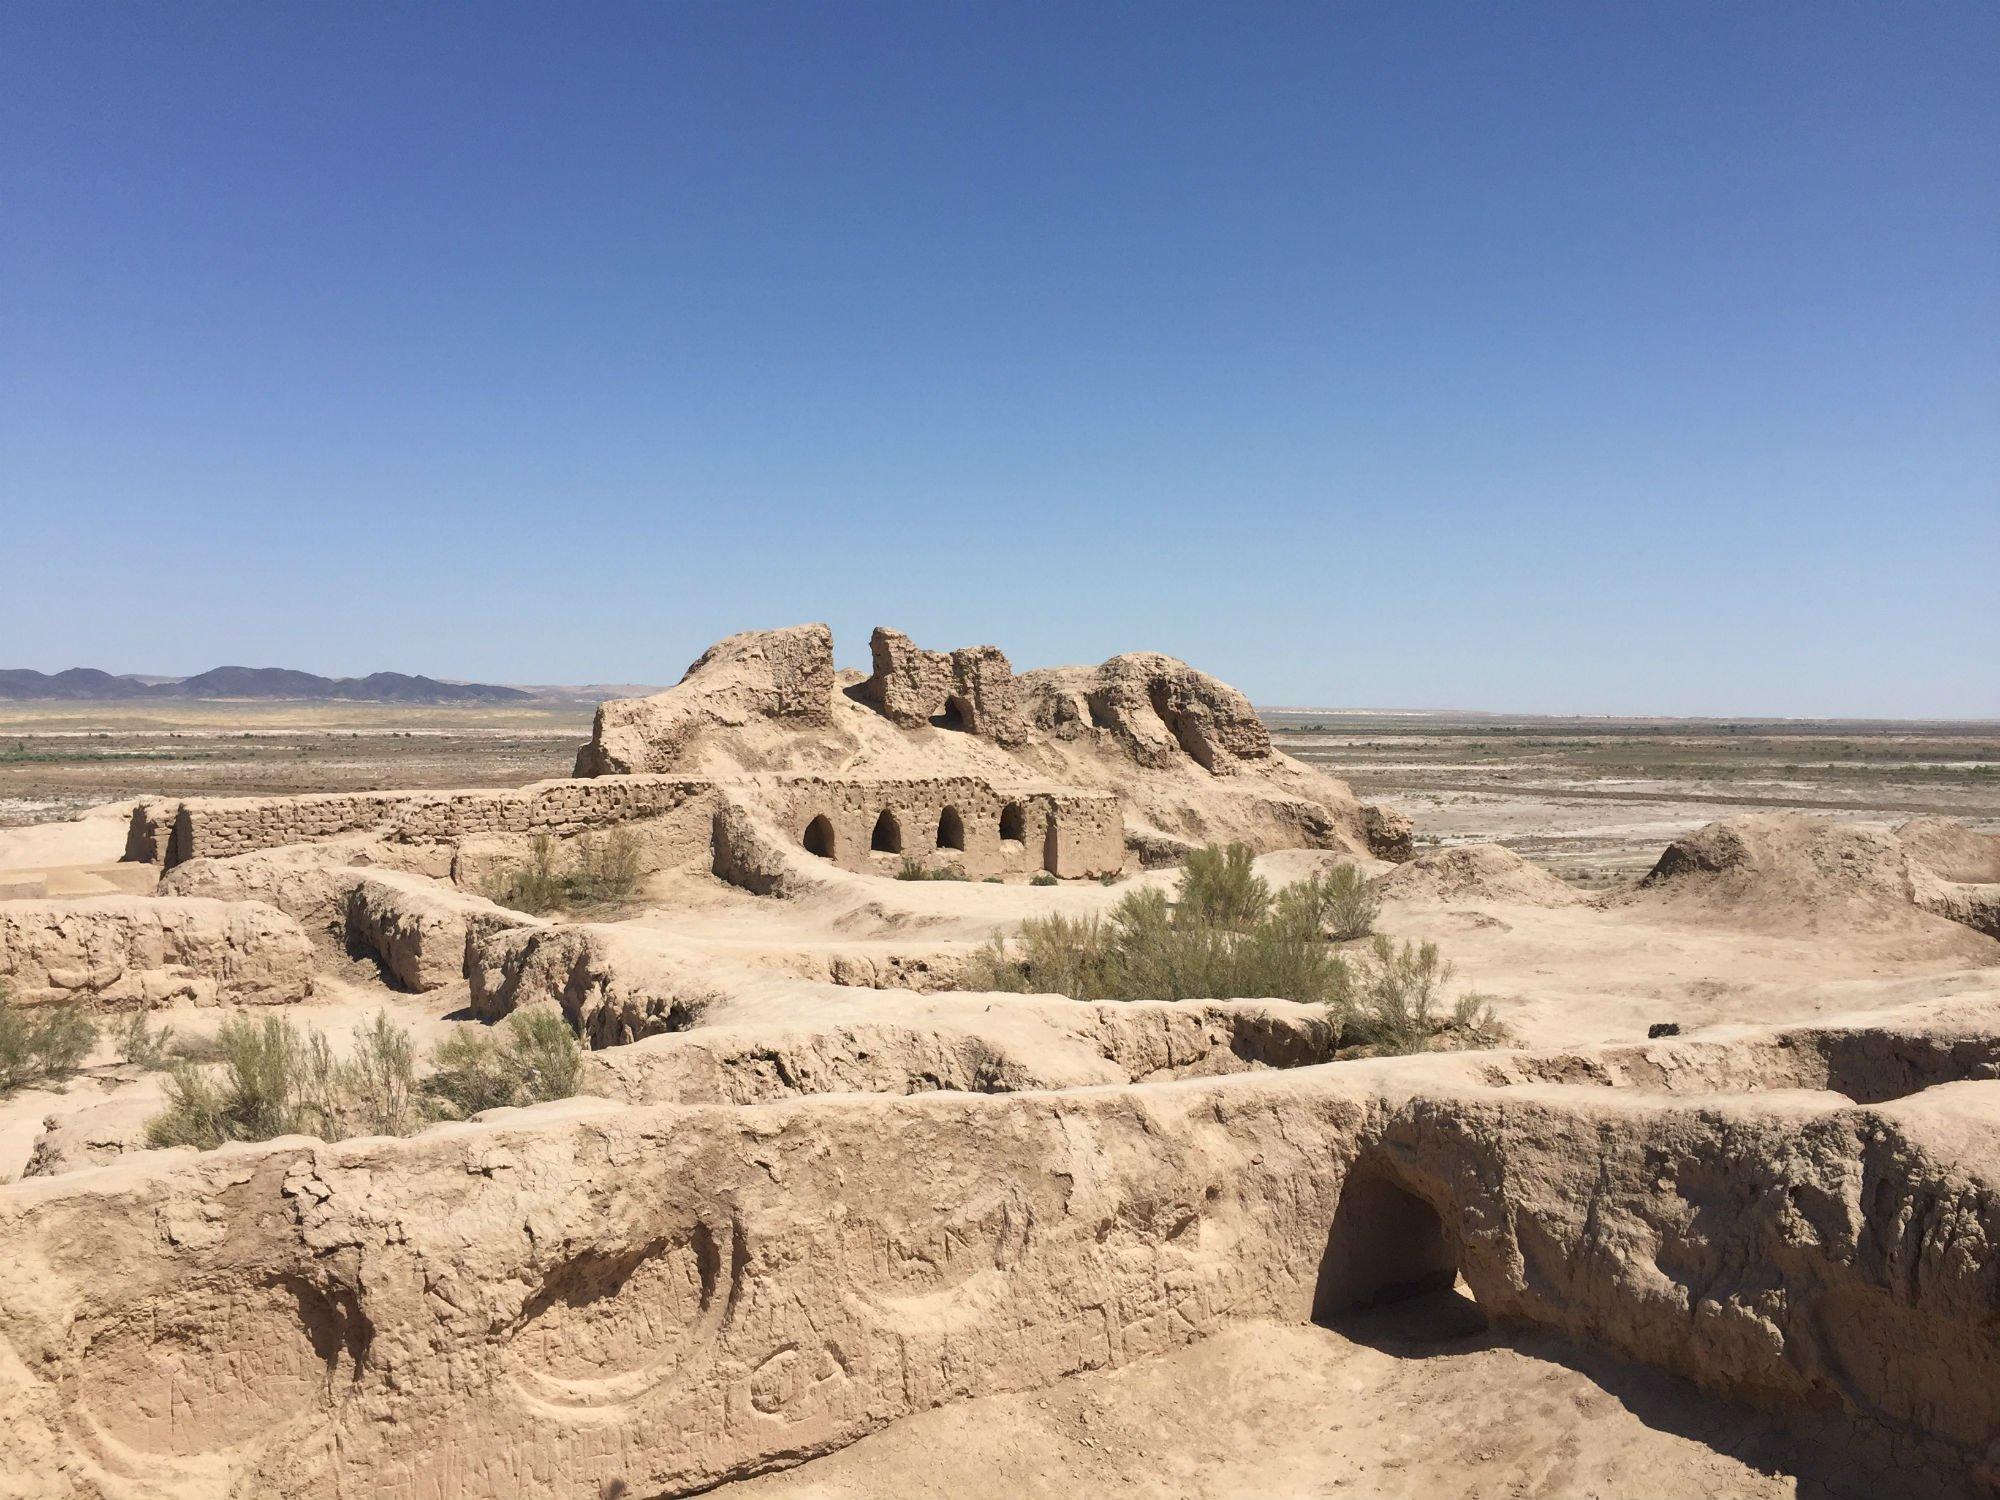 UZBEKISTAN Khiva fortezze nel deserto VIAGGIO IN UZBEKISTAN